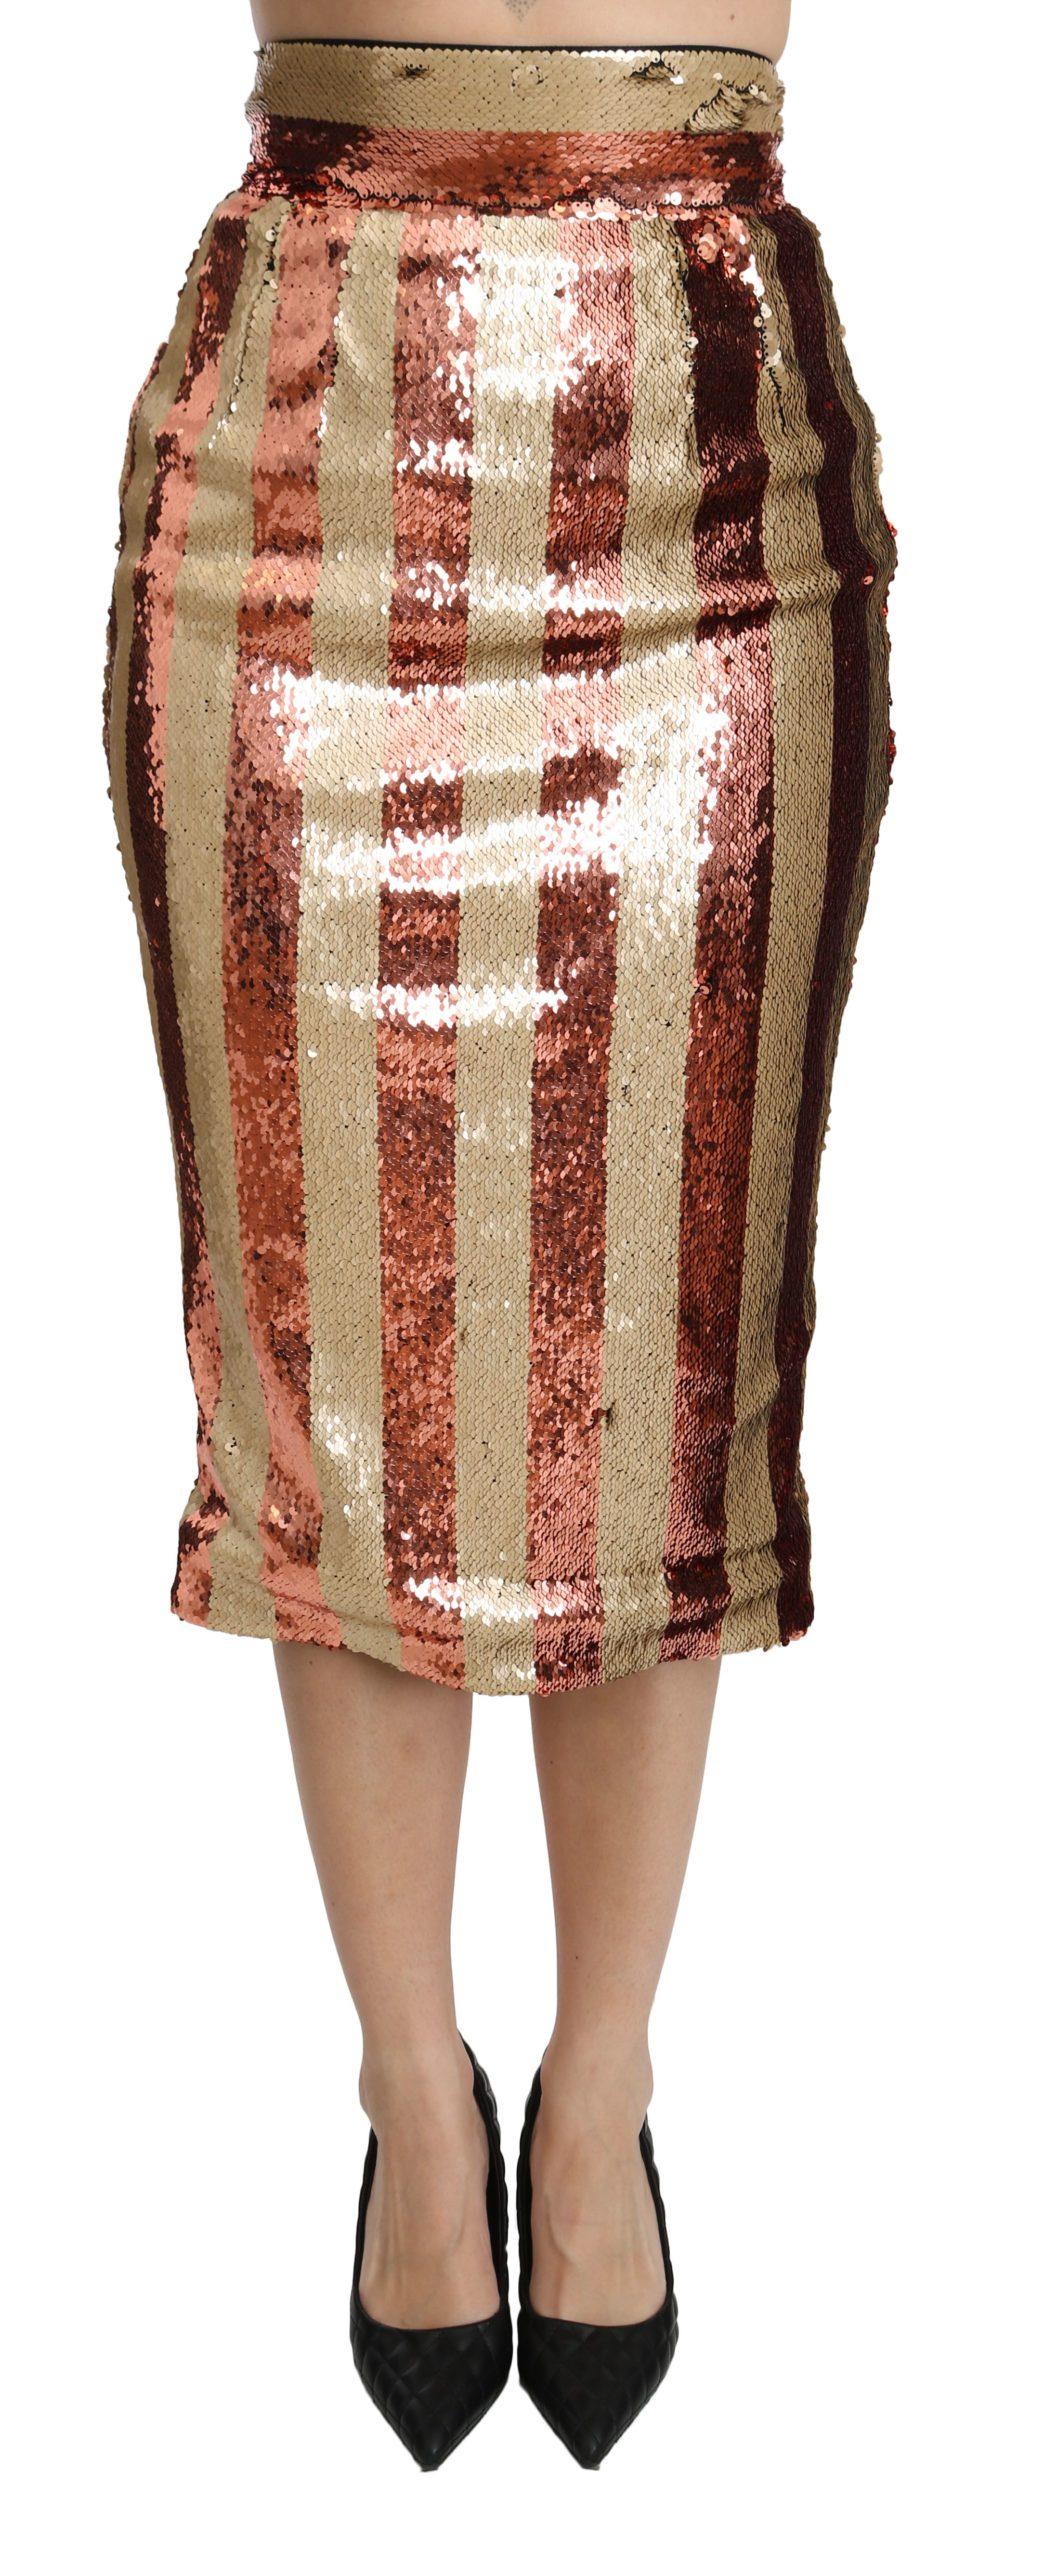 Dolce & Gabbana Women's Striped High Waist Midi Skirt Gold SKI1371 - IT40|S